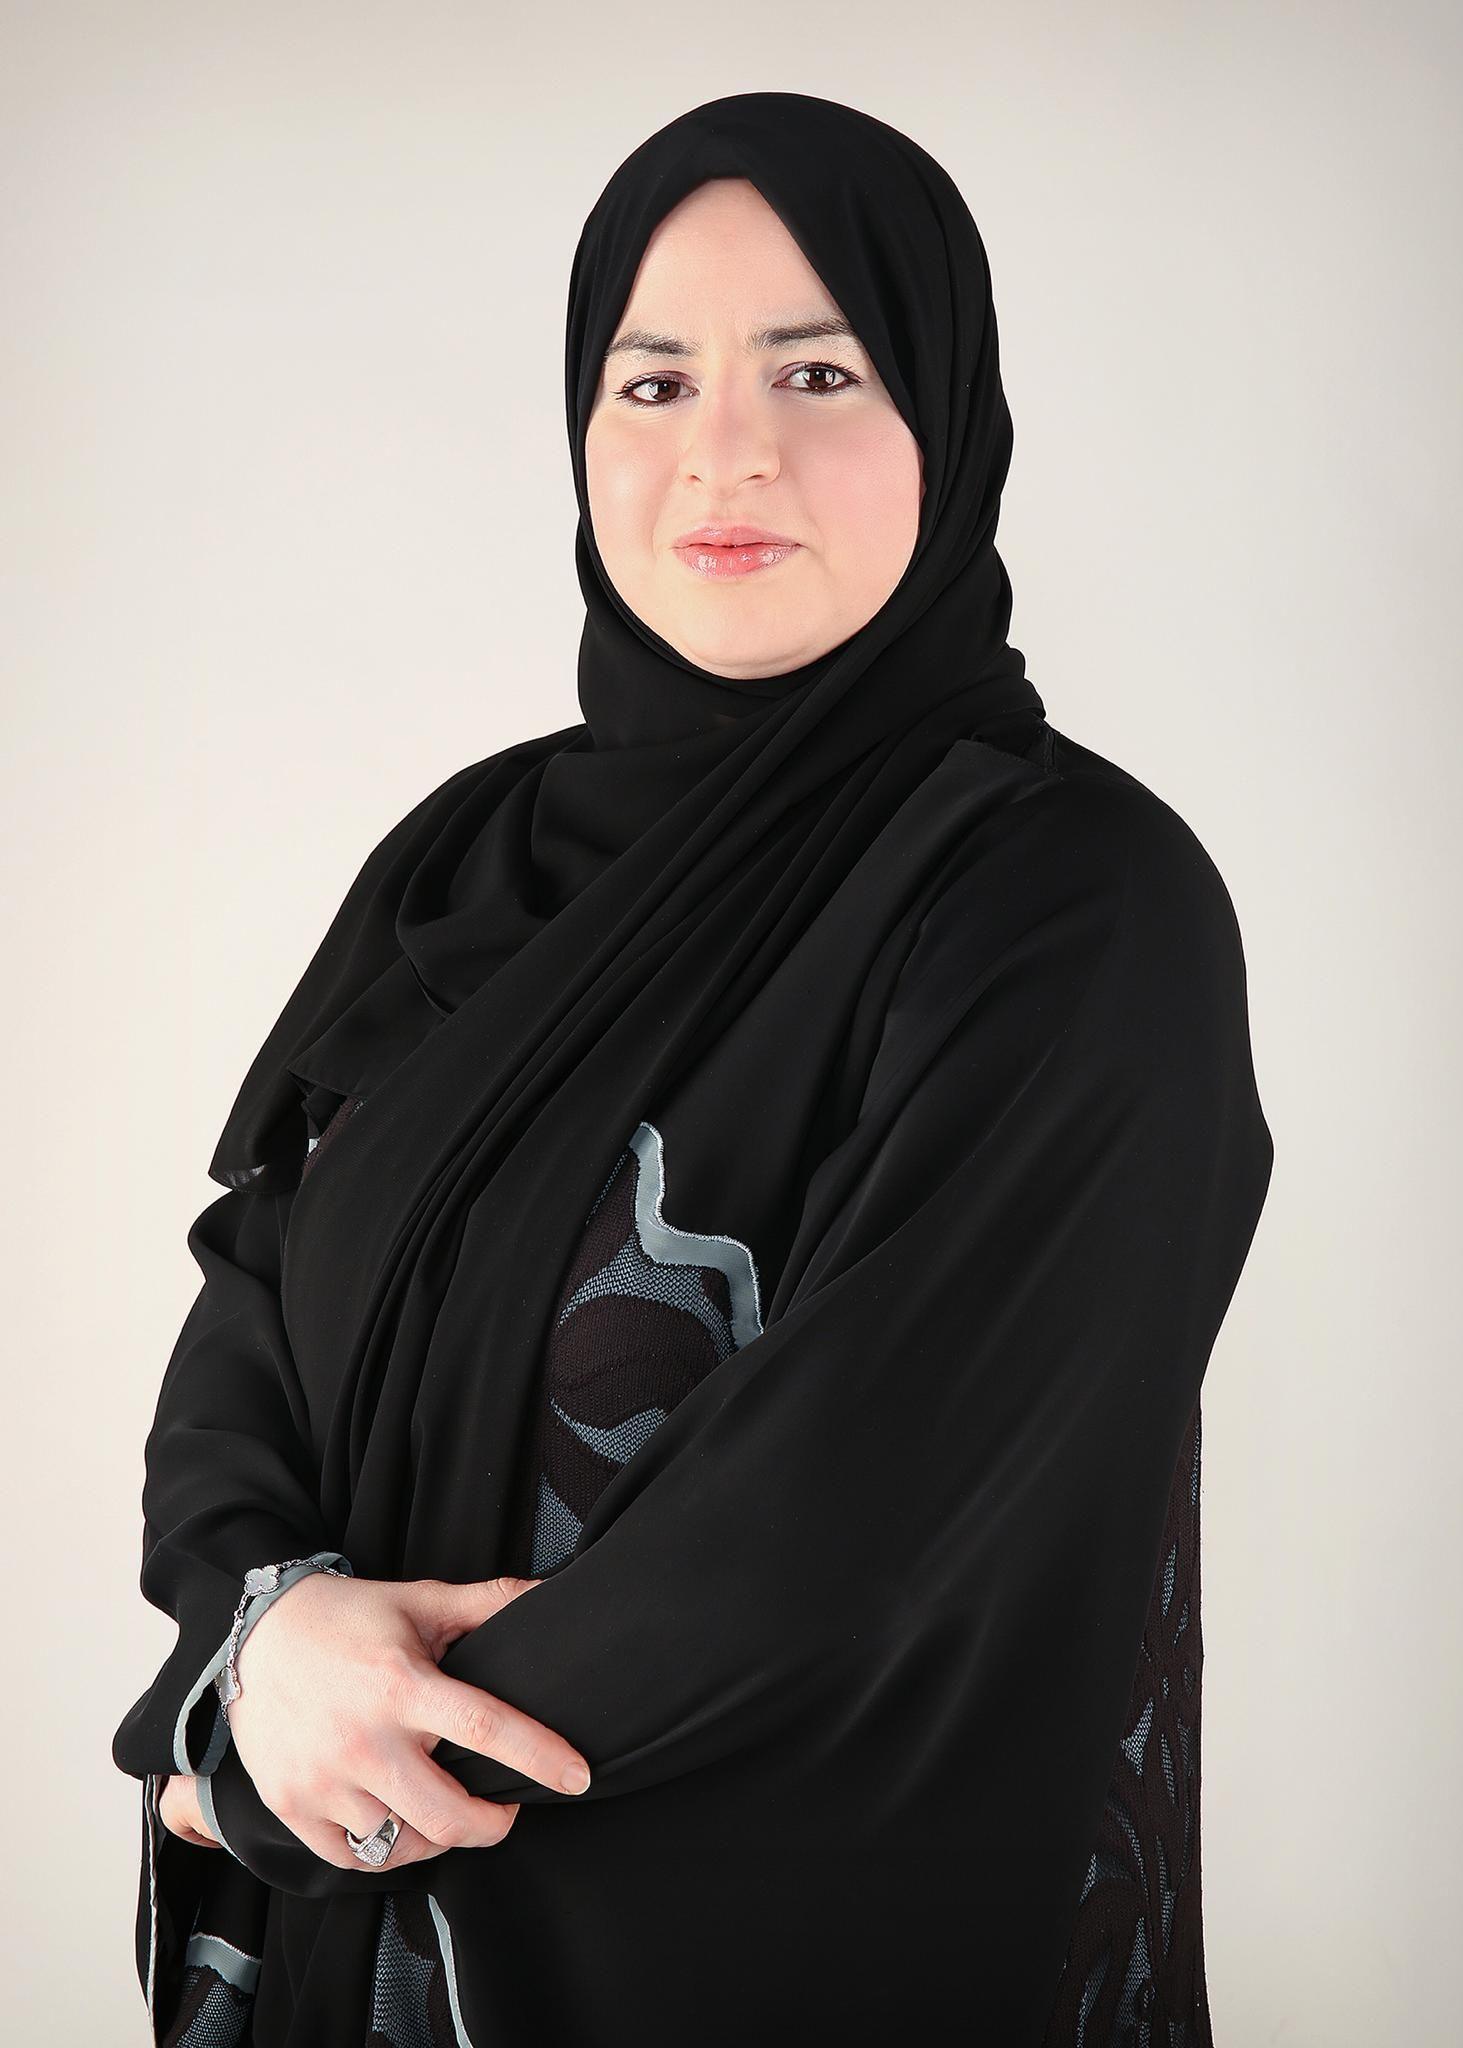 Dr. Asma Ibrahim Al Mannaei